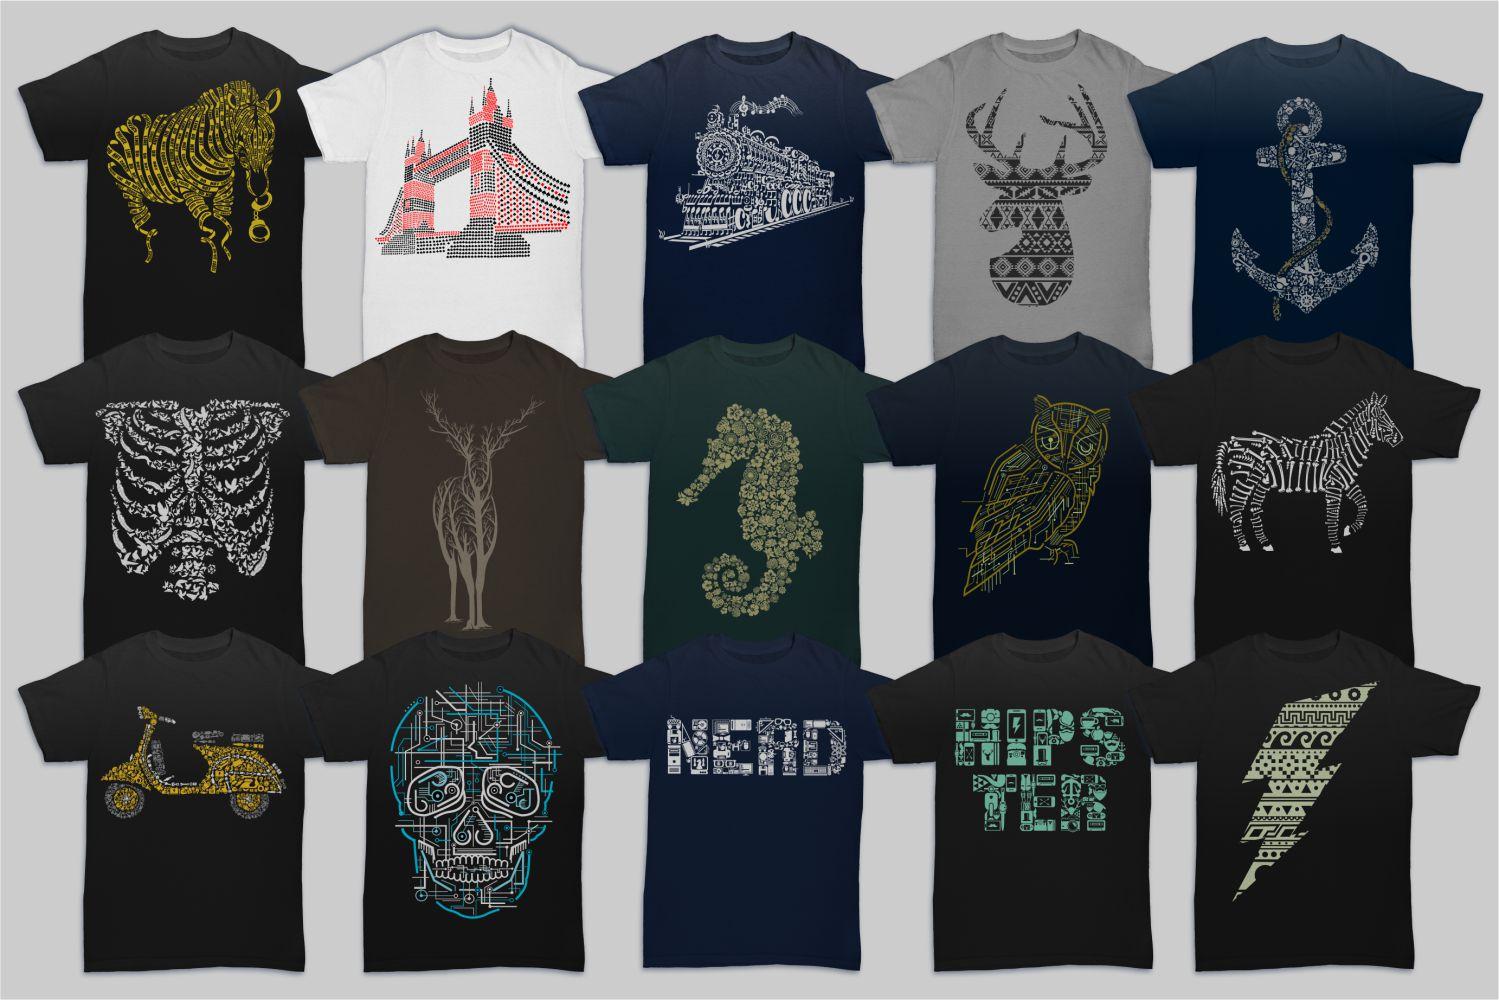 Tshirt Designs Mega Bundle Pack 1 + Pack 2 example image 3